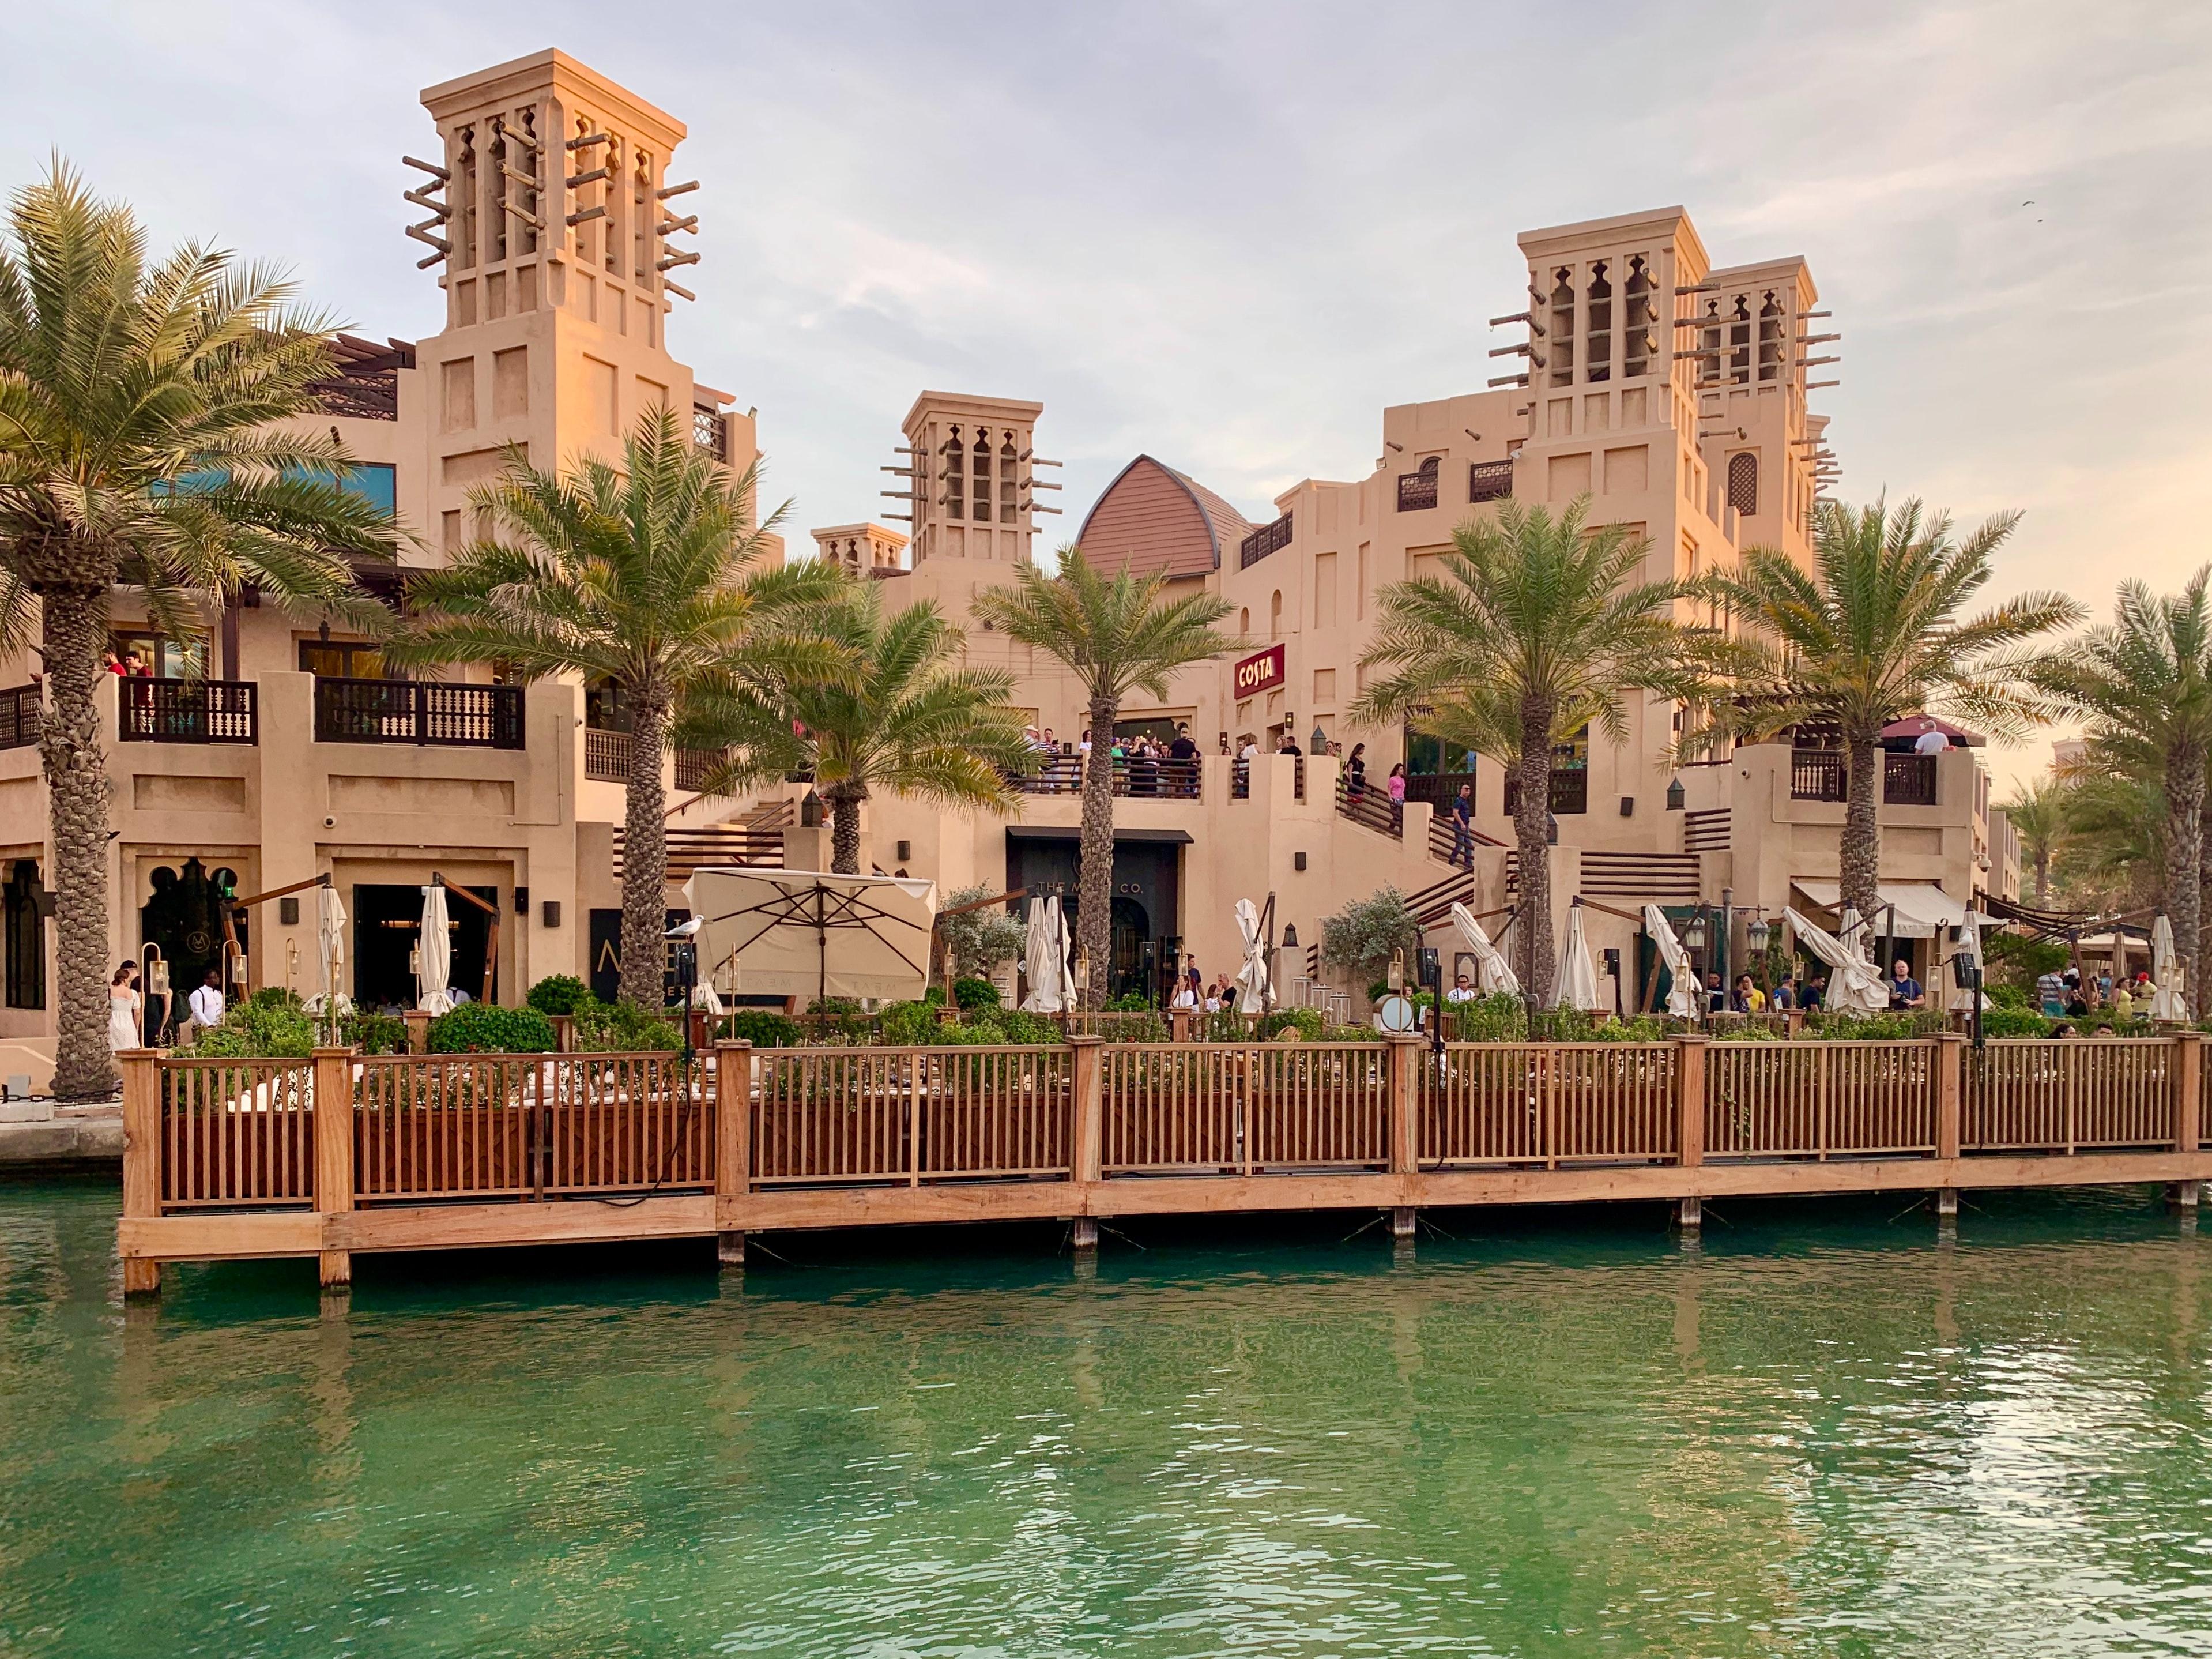 Best Places to Visit in Dubai - Souk Madinat Jumeirah - 3